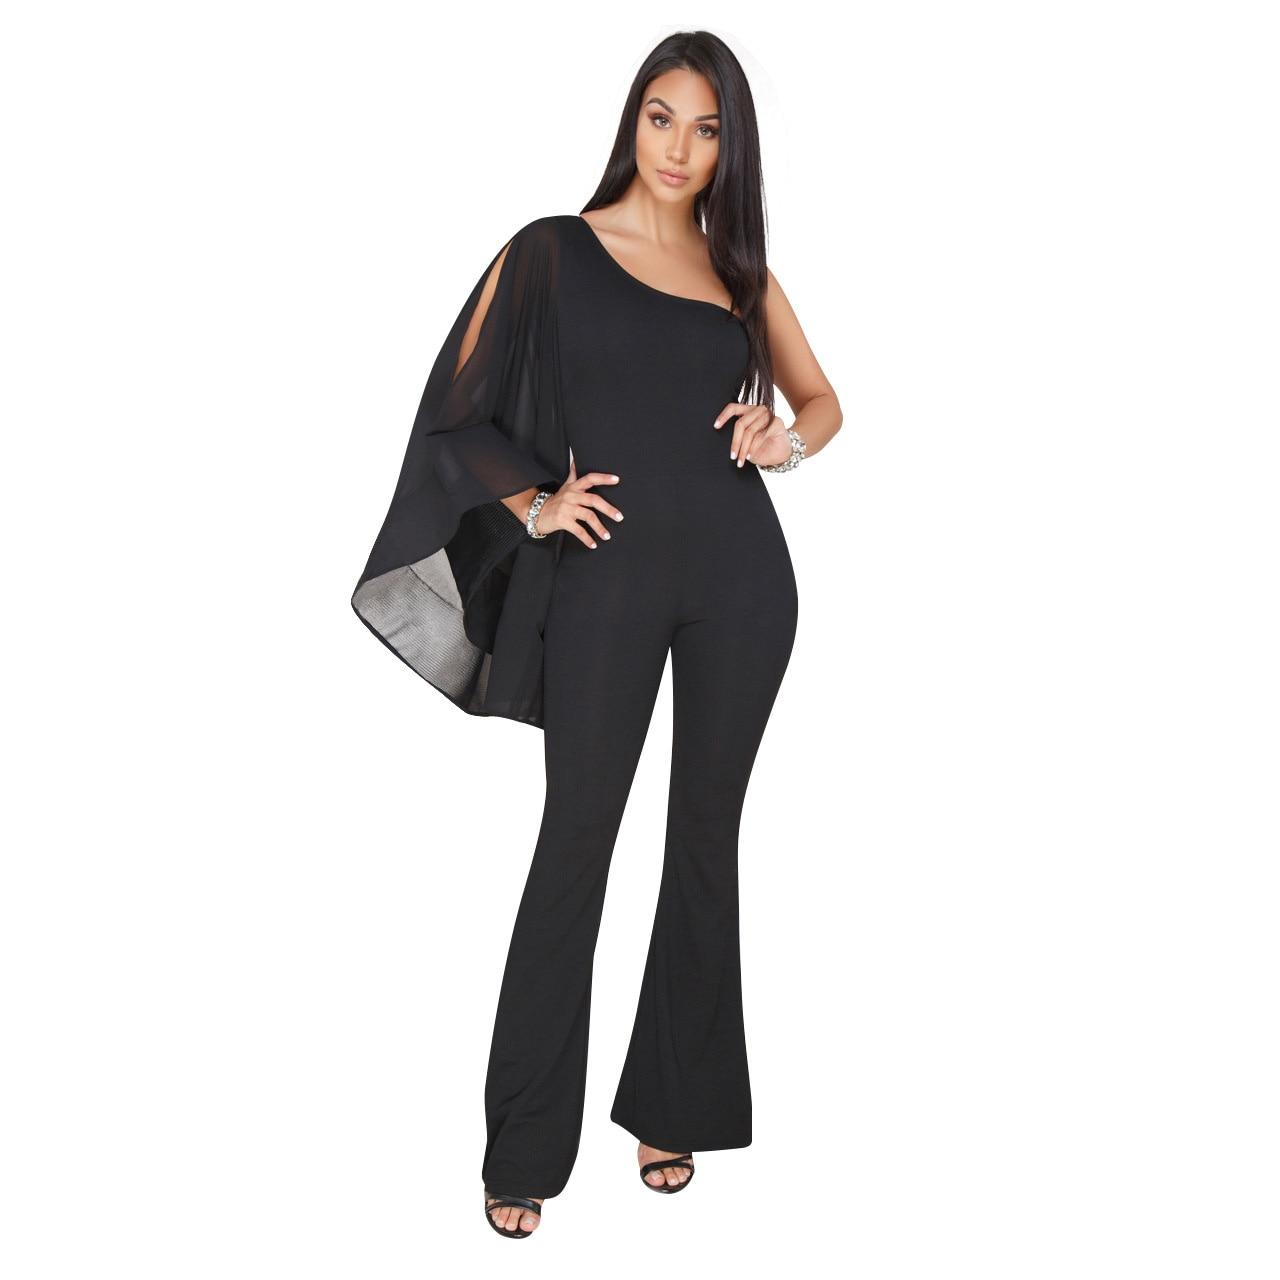 Summer One Shoulder Asymmetrical High Waist Jumpsuit Backless Elegant Boot Cut Jumpsuits Women Black Chiffon Party Rompers